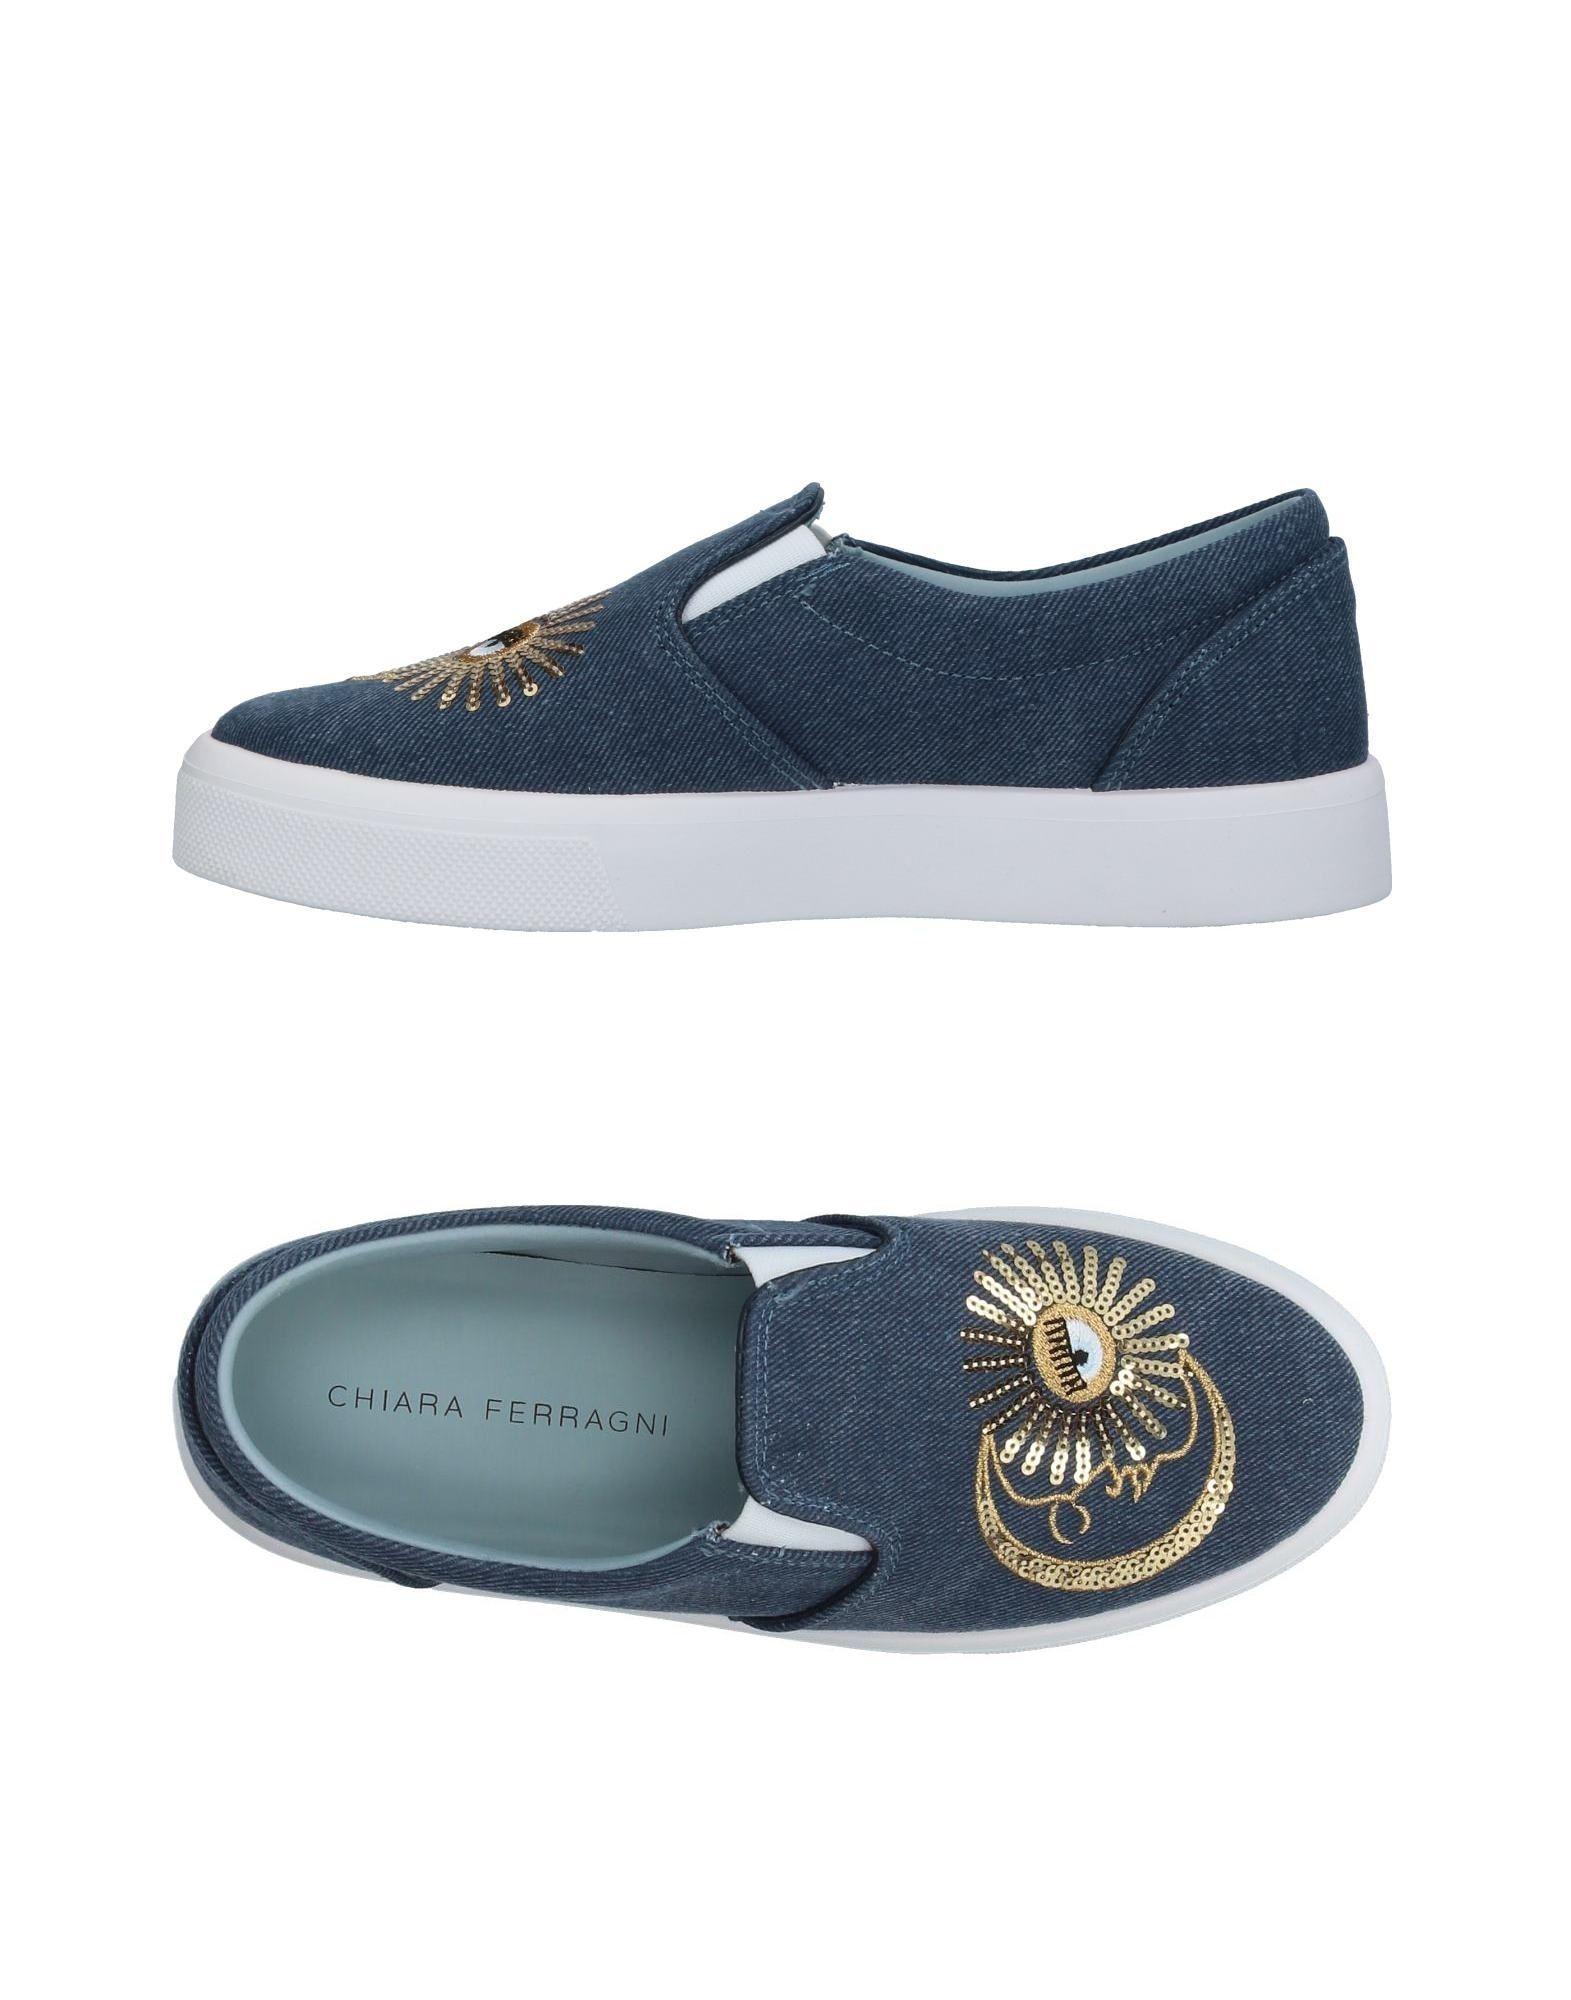 Chiara Ferragni Sneakers 11380728RS Damen  11380728RS Sneakers Neue Schuhe 75fcec